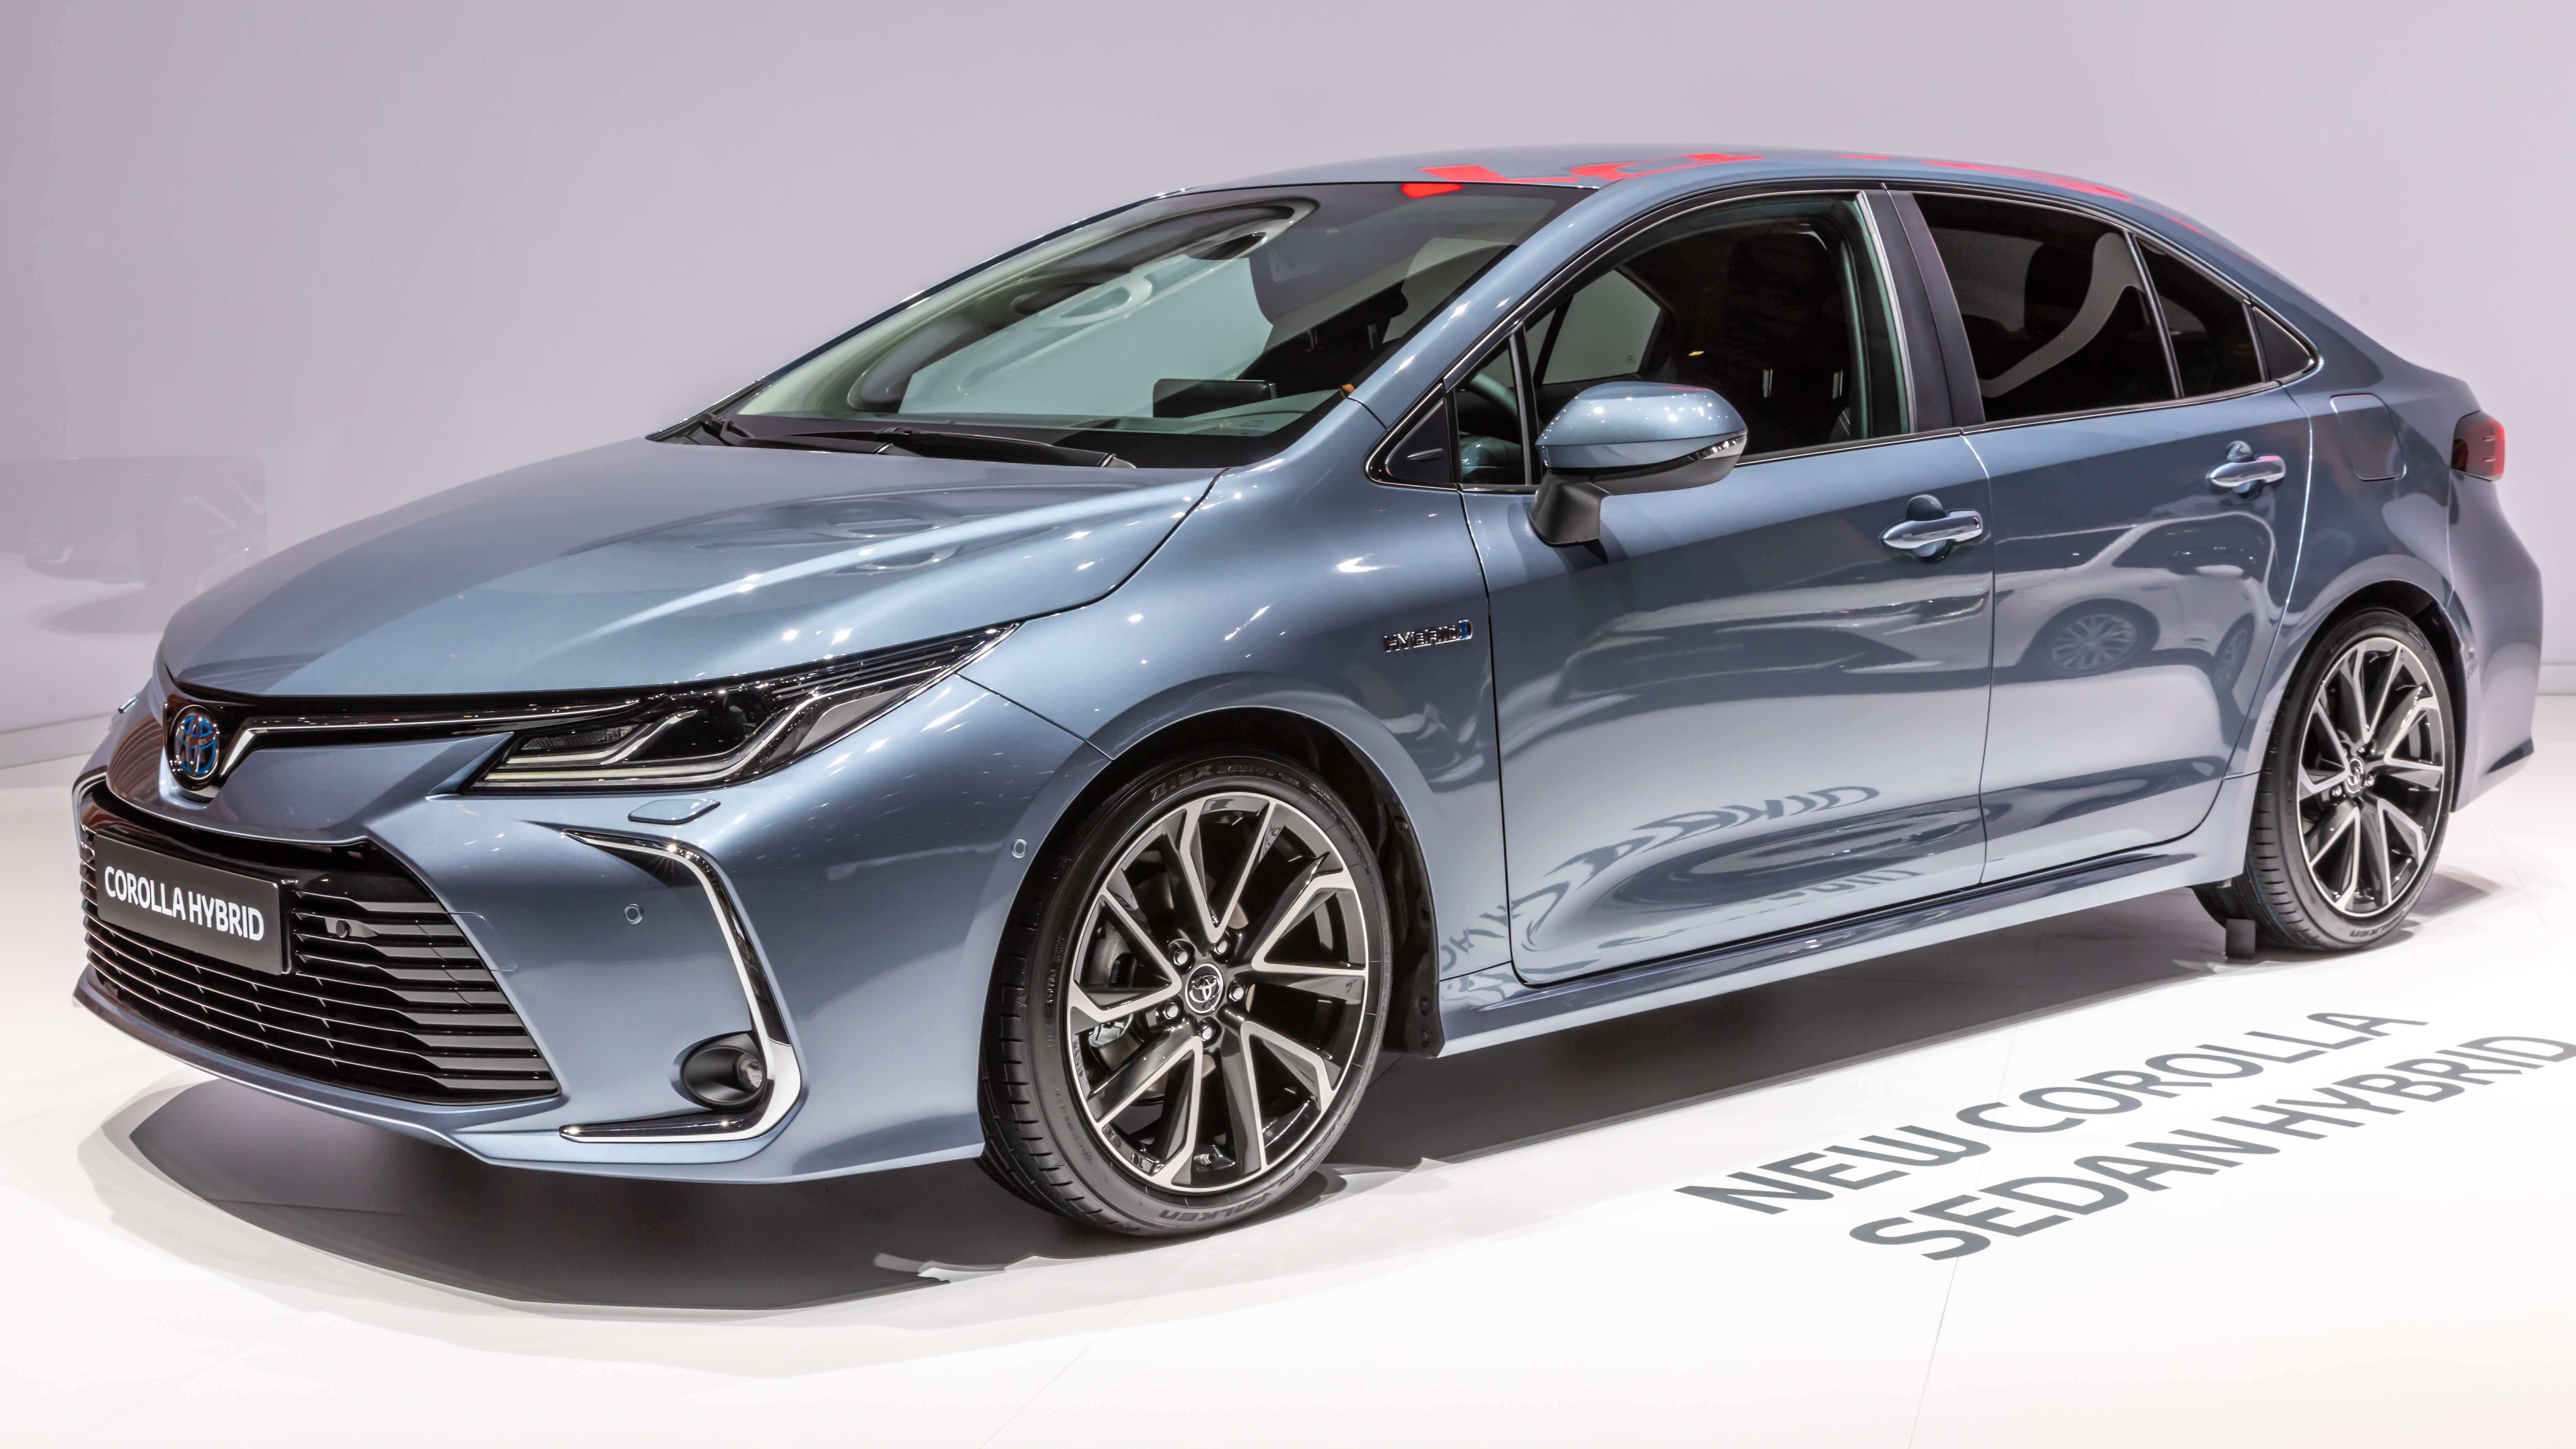 31 New Toyota Premio 2020 Configurations by Toyota Premio 2020